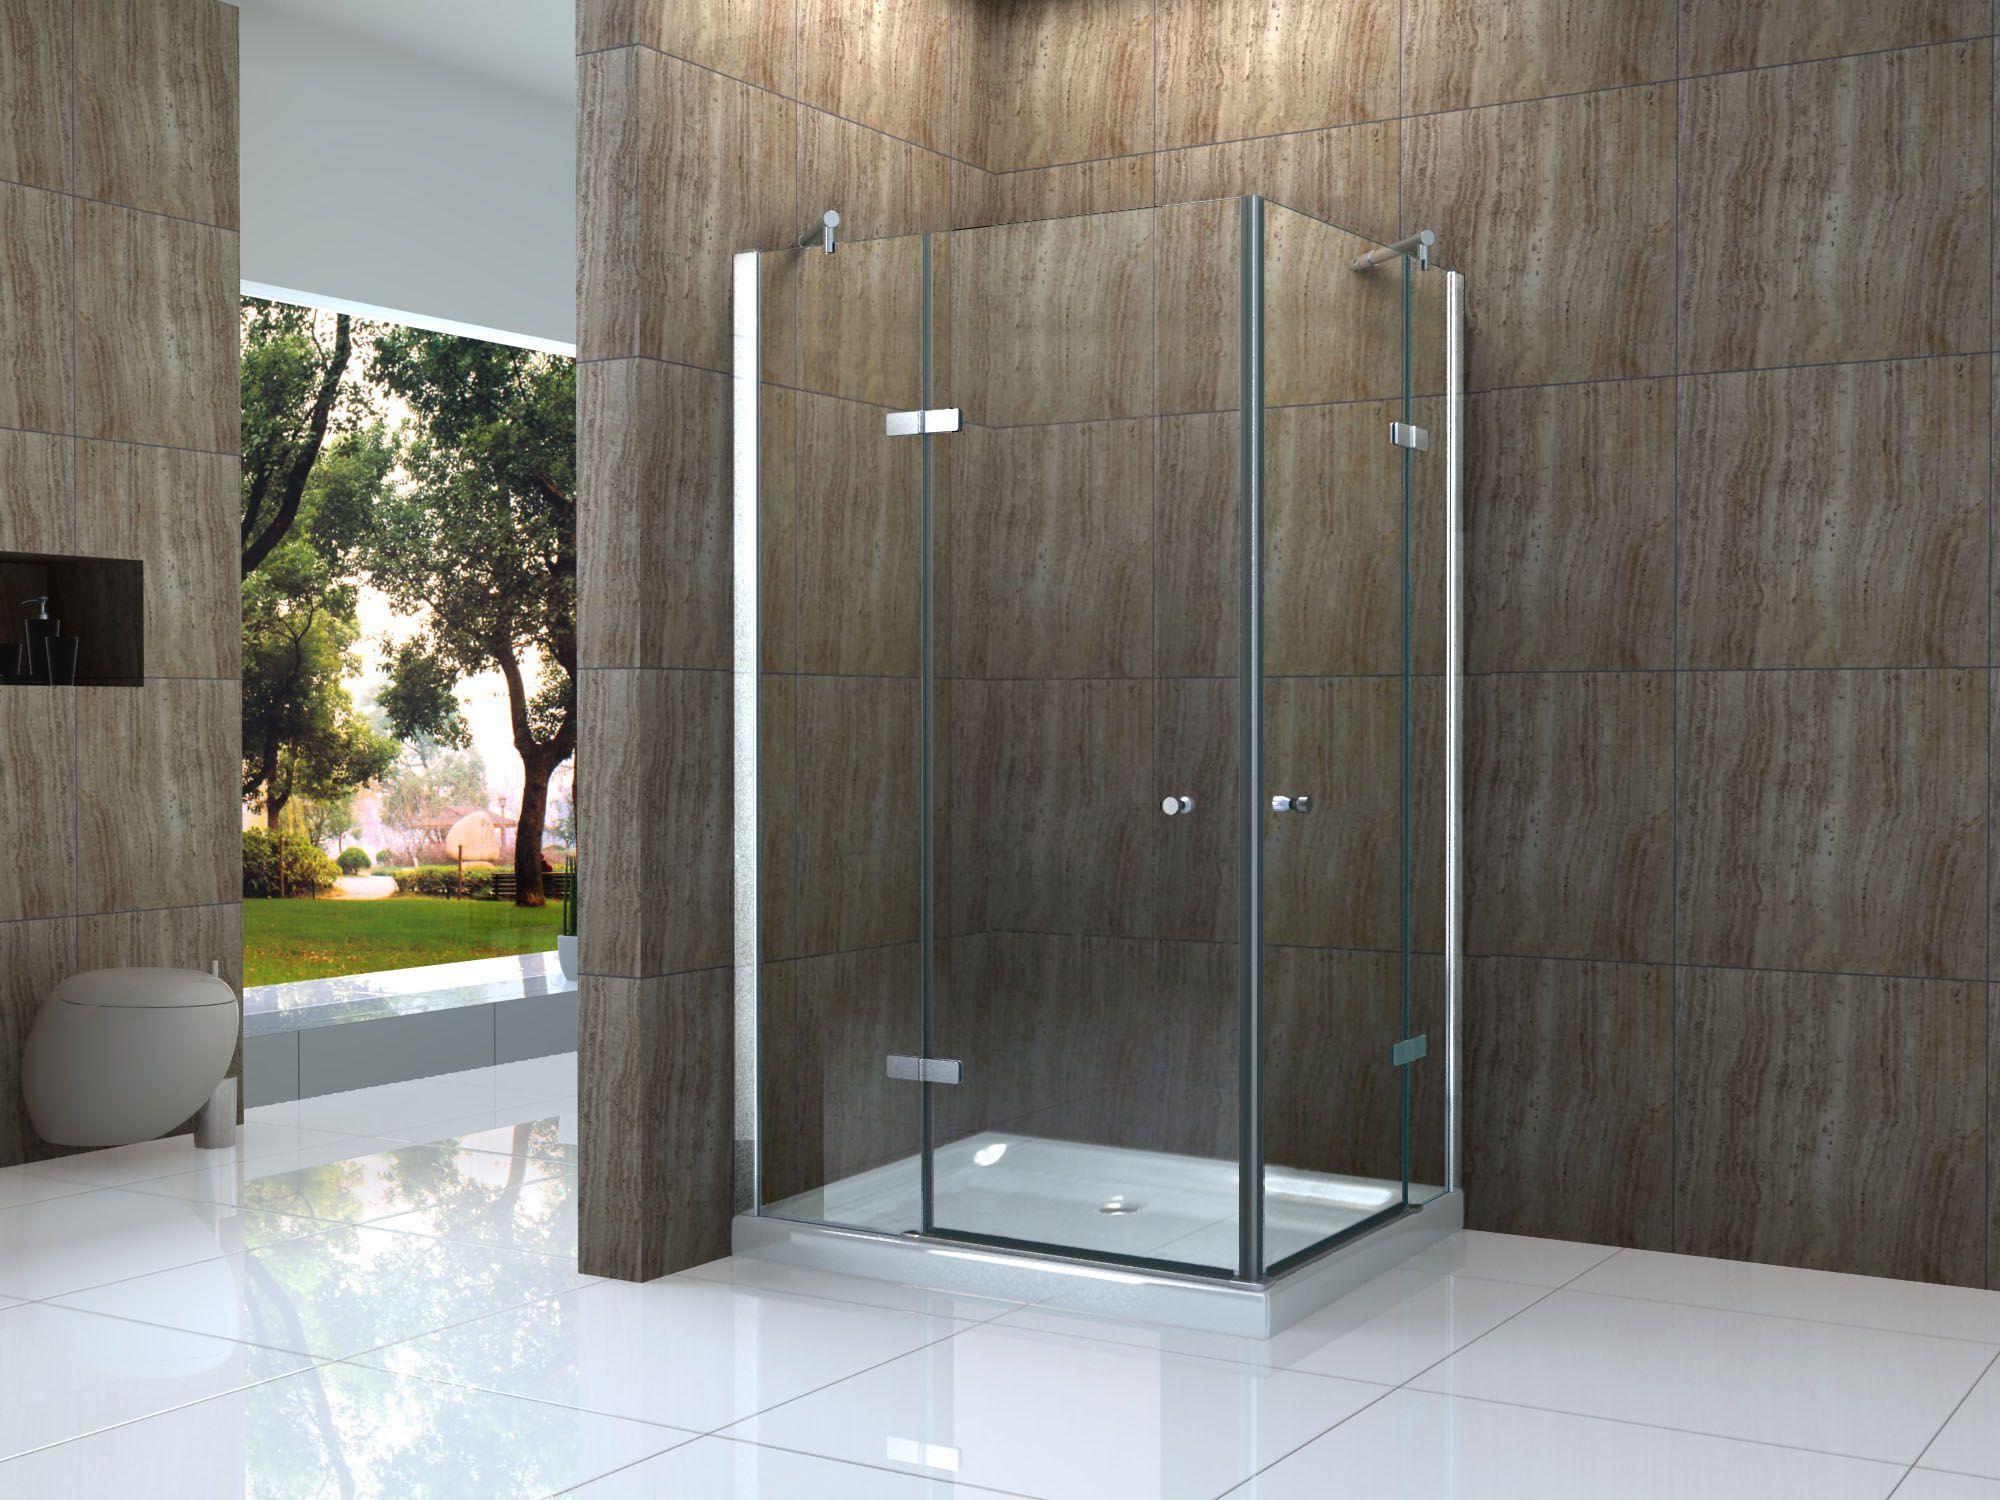 Neu CANTO 120 x 90 cm Glas Dusche Duschkabine Duschwand  PL99